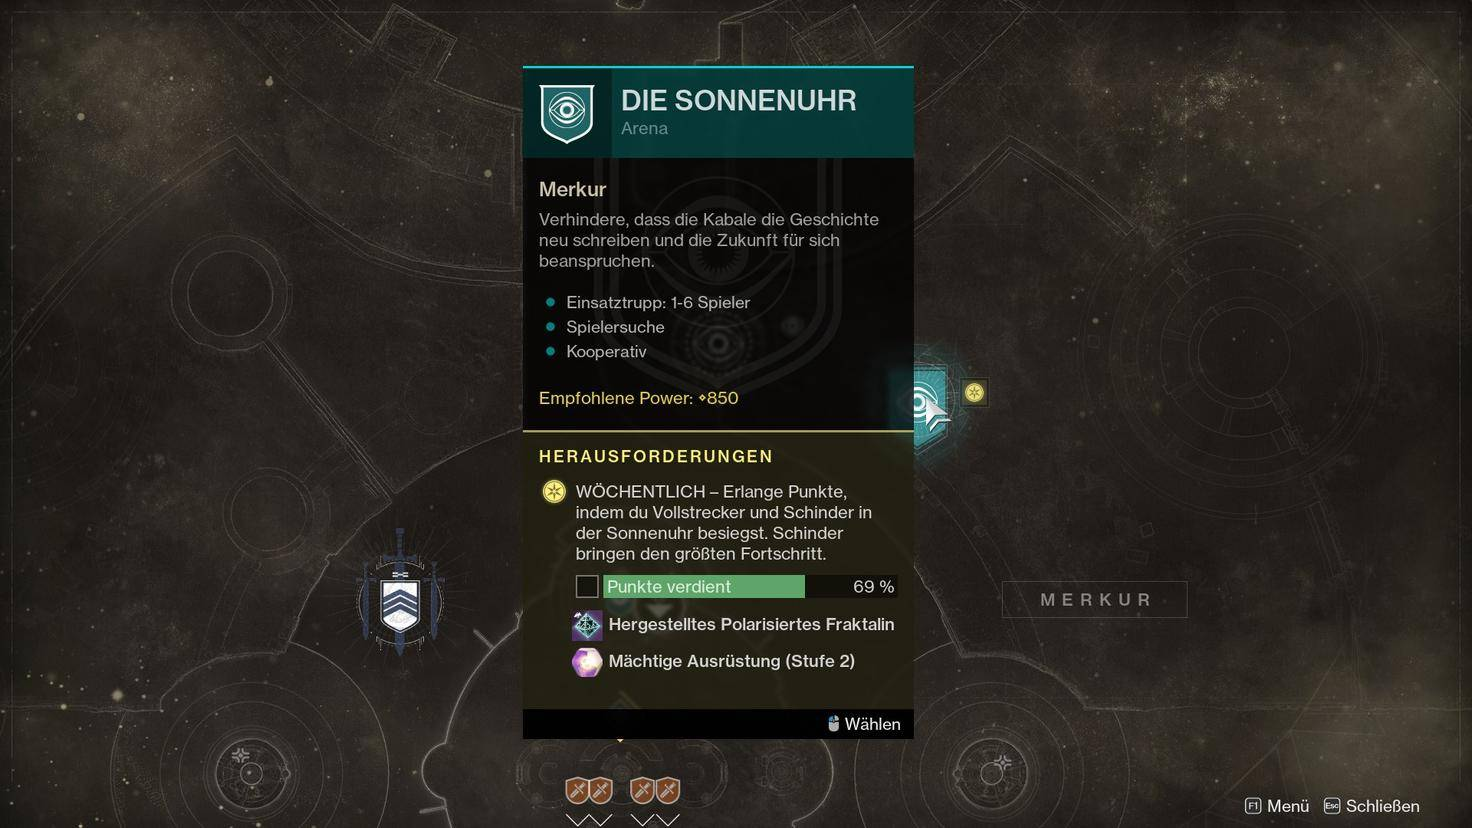 destiny-2-sonnenuhr-karte (1)